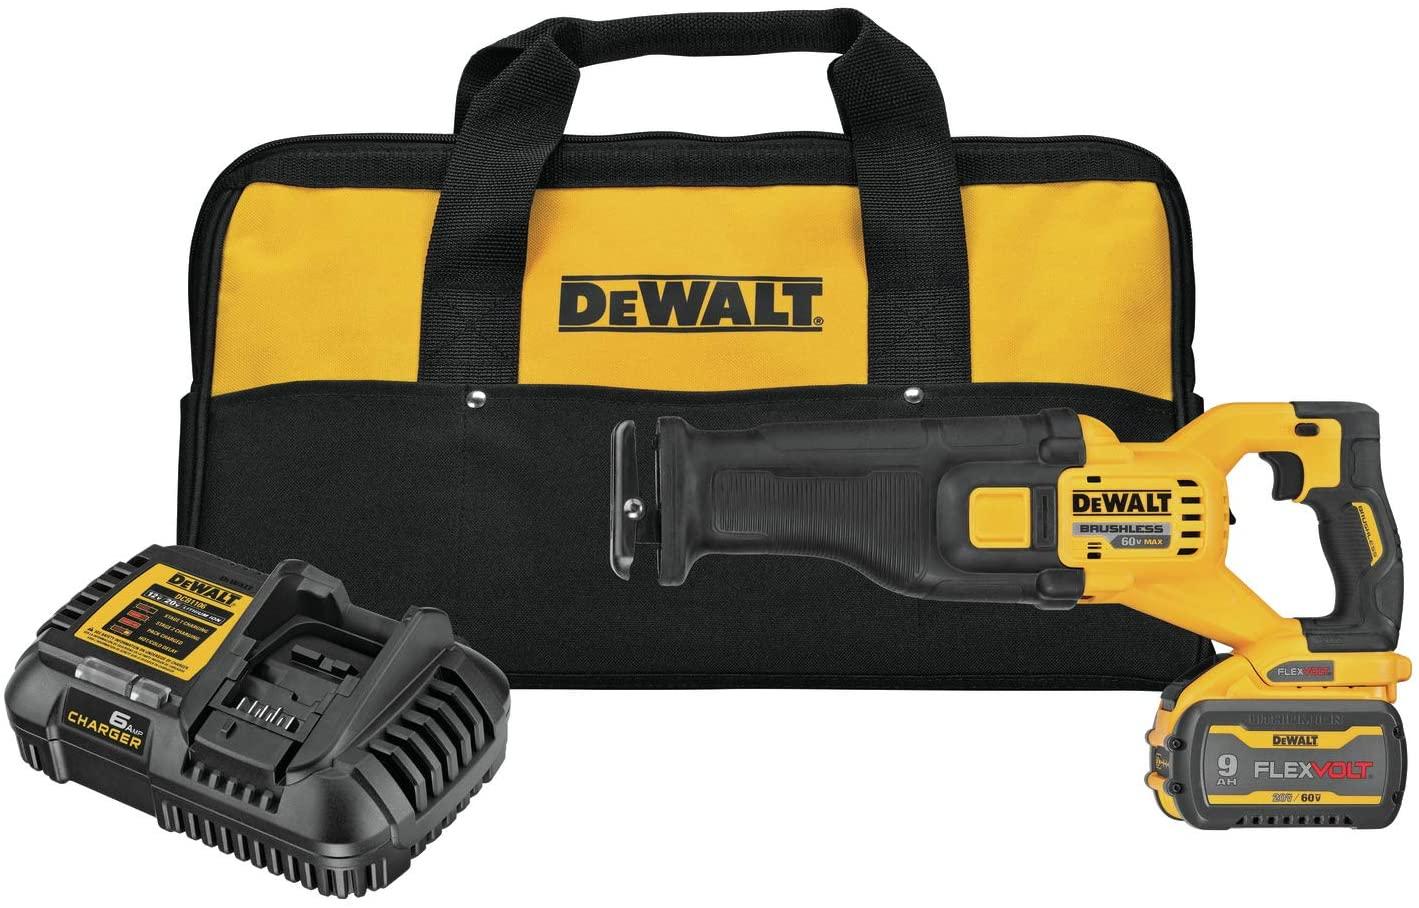 Dewalt DCS389X1 Flexvolt 60V MAX Brushless Cordless Reciprocating Saw Kit